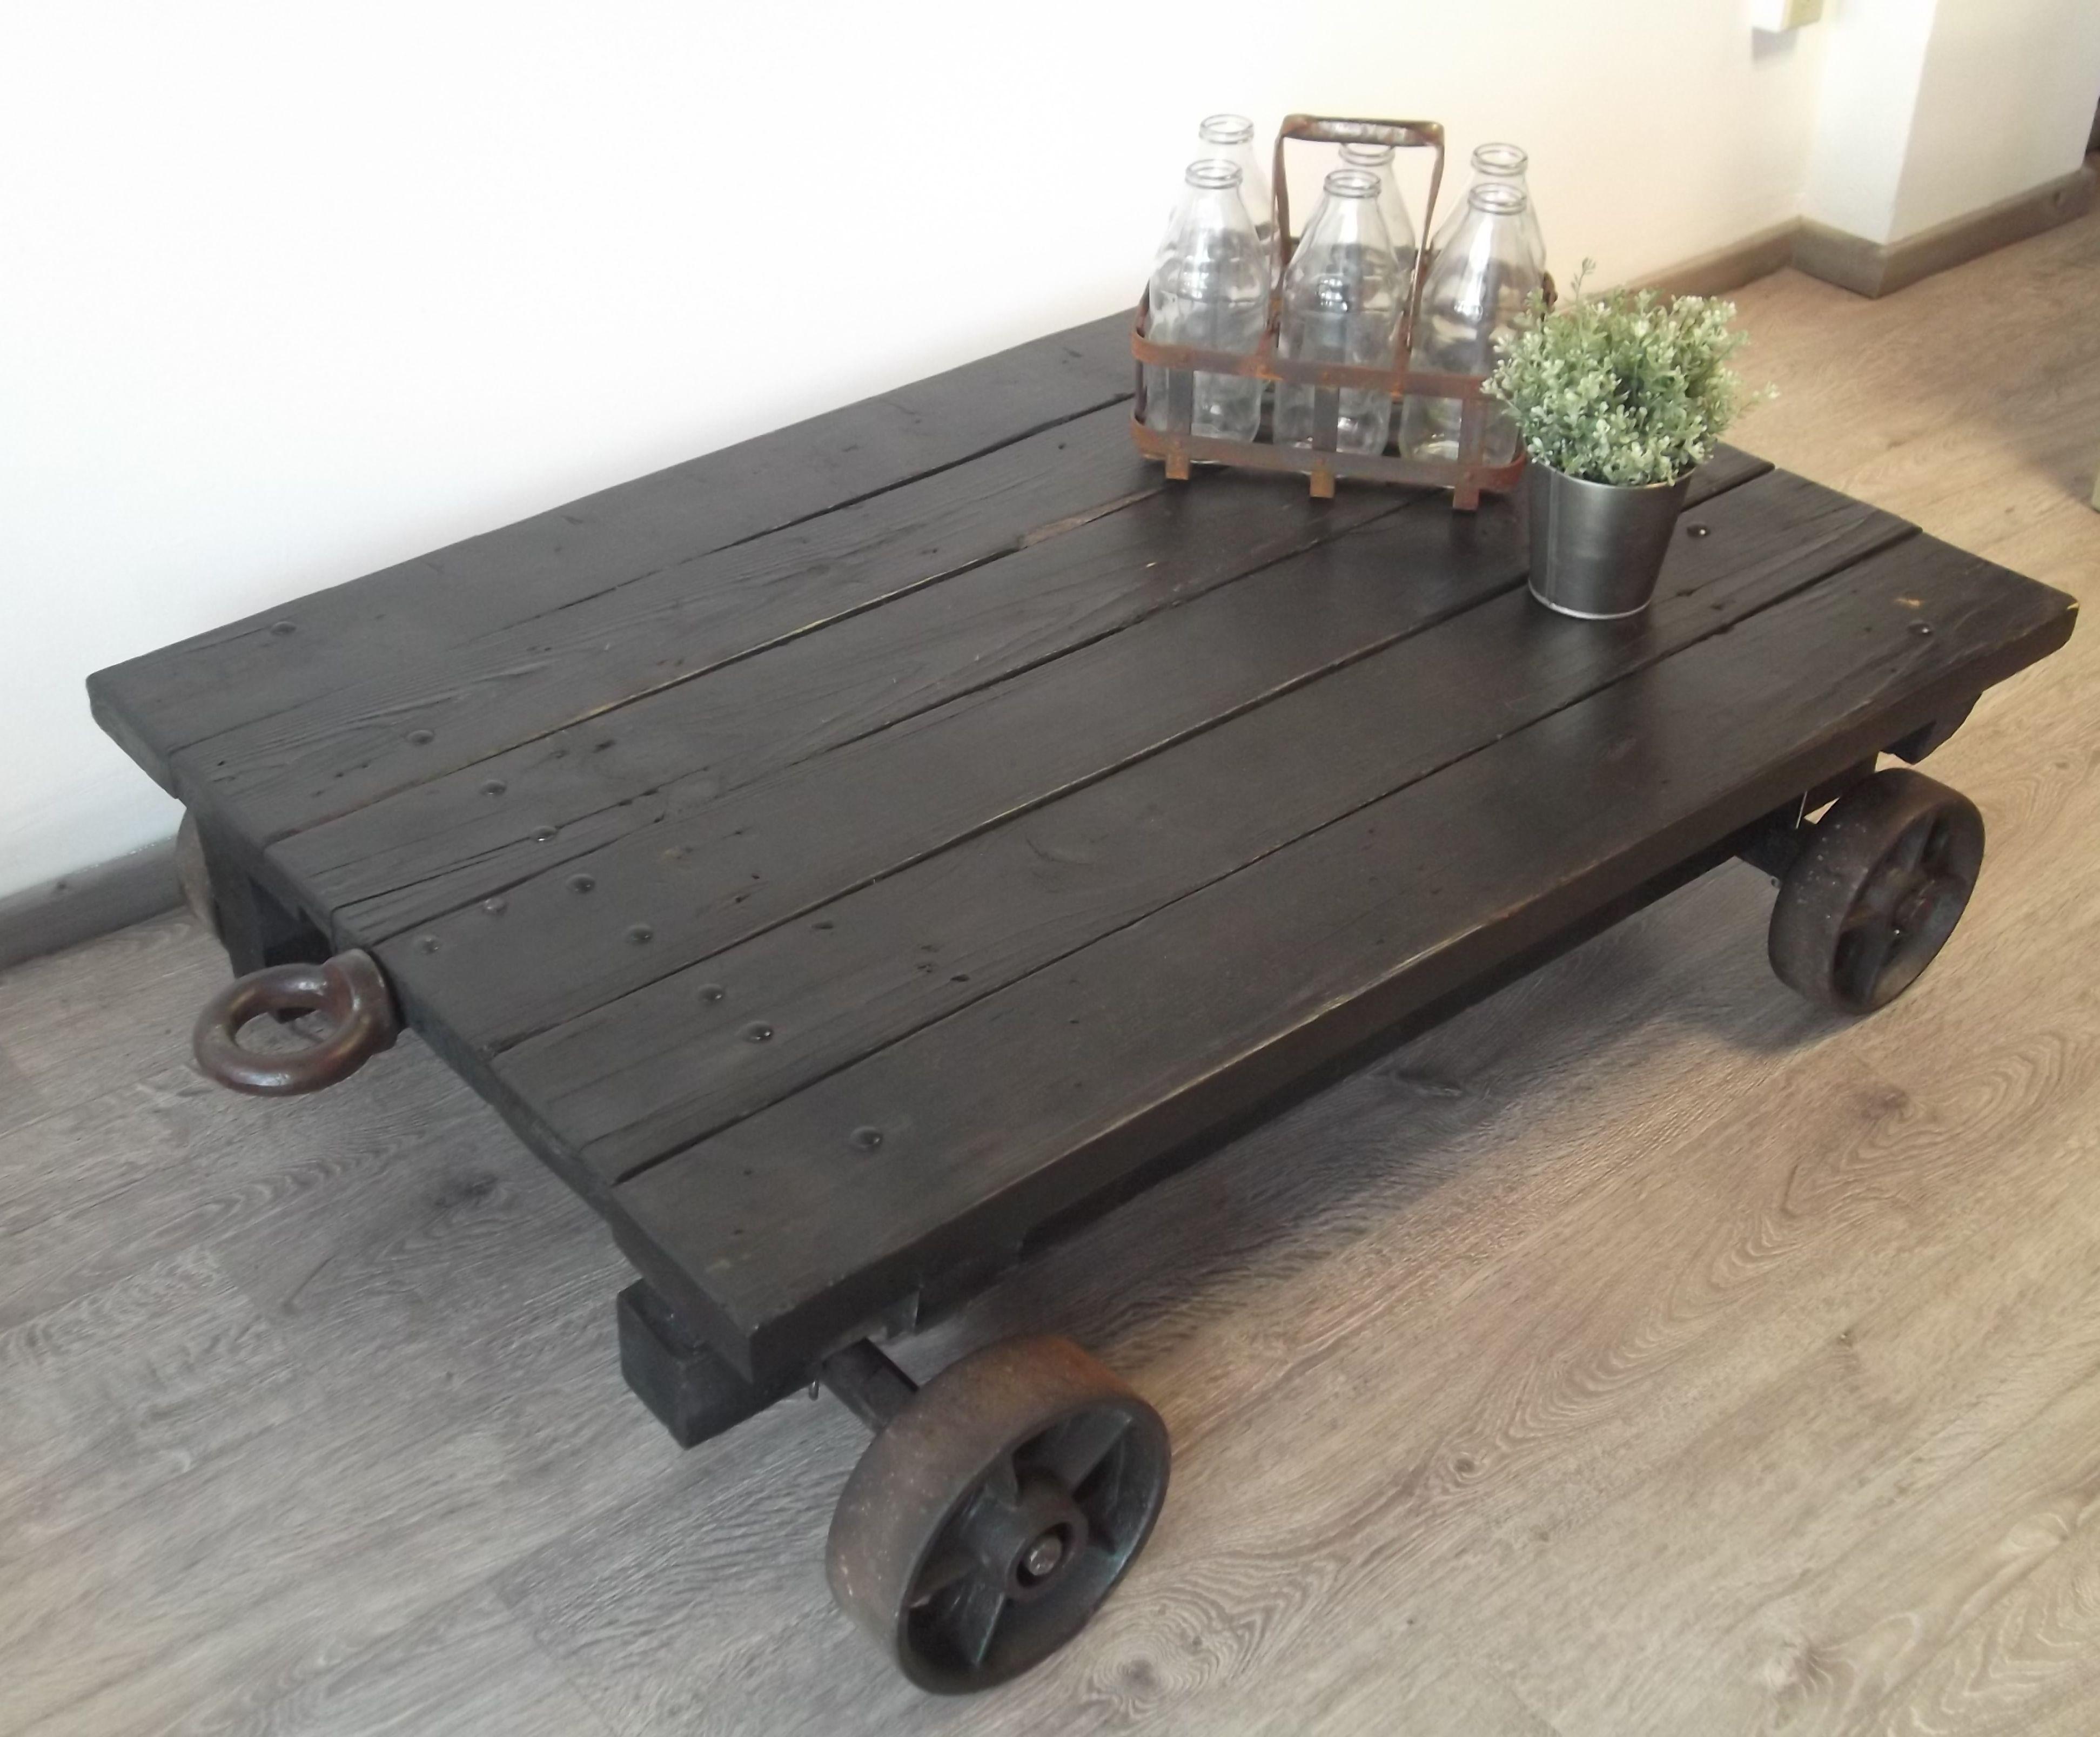 Pin de menilsa en ah ap pinterest mesas madera y - Mesas de centro con ruedas ...